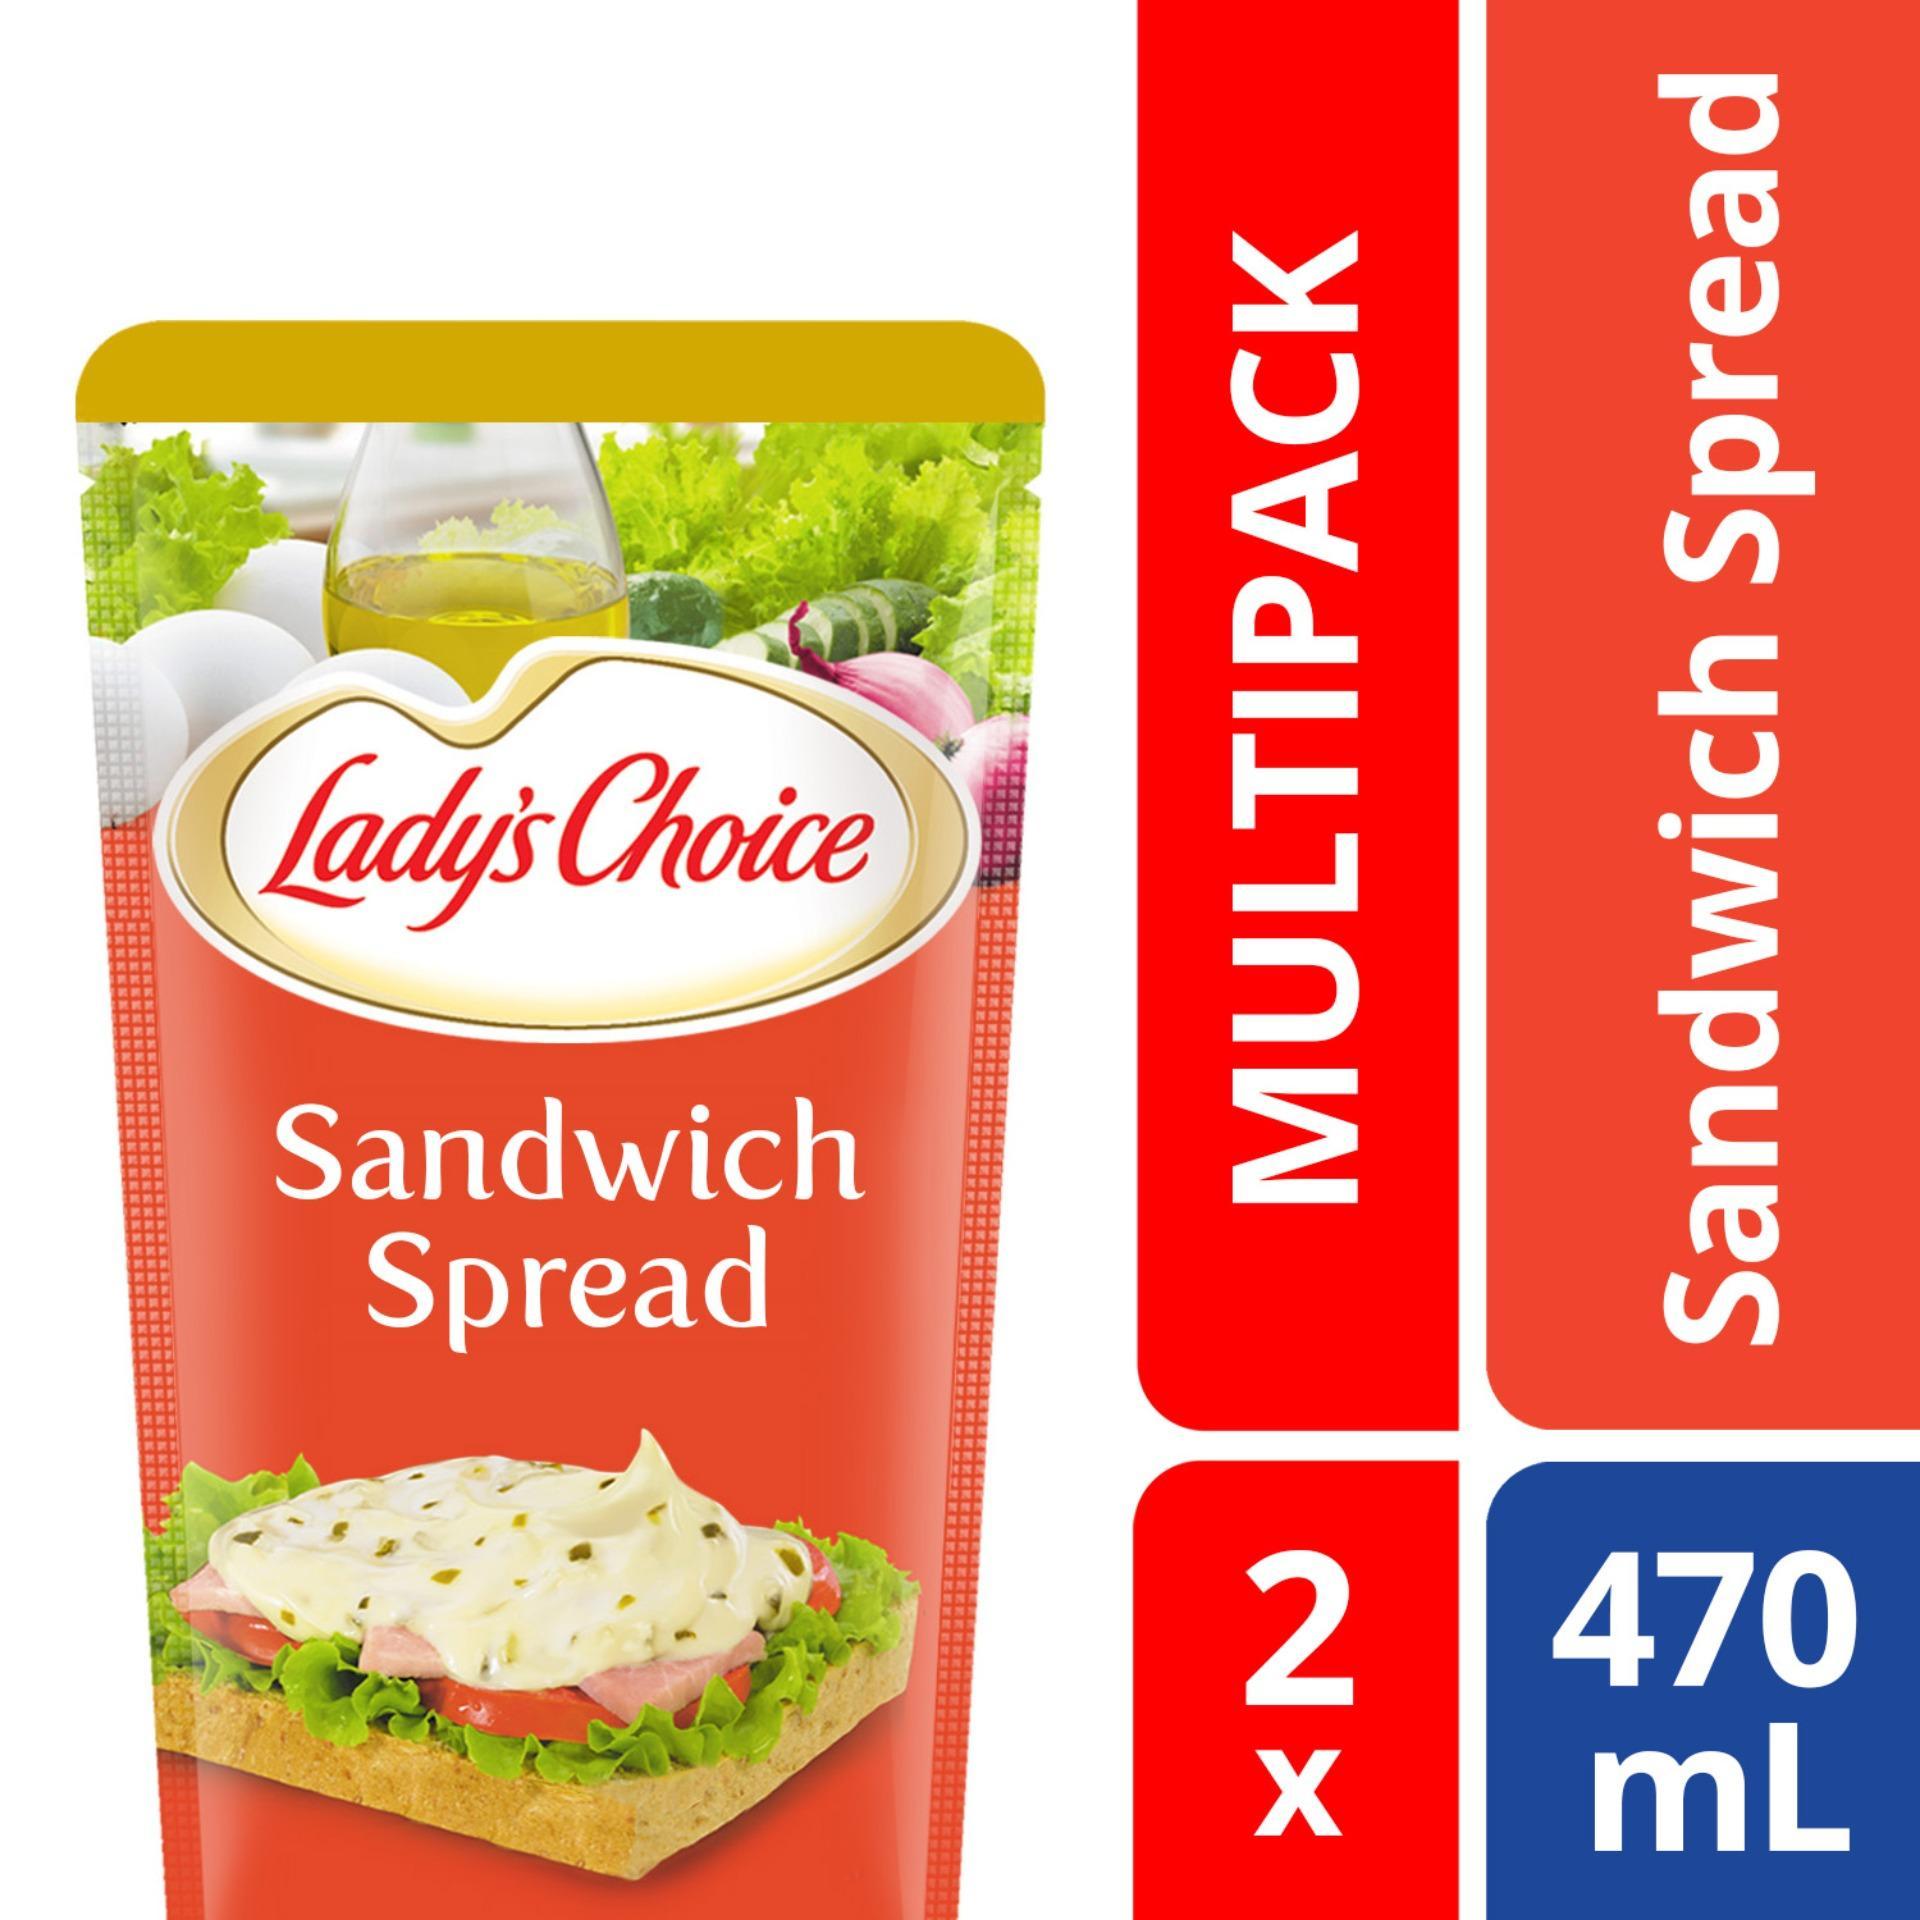 Ladys Choice Sandwich Spread Doy 470ml 2x By Unilever Foods.